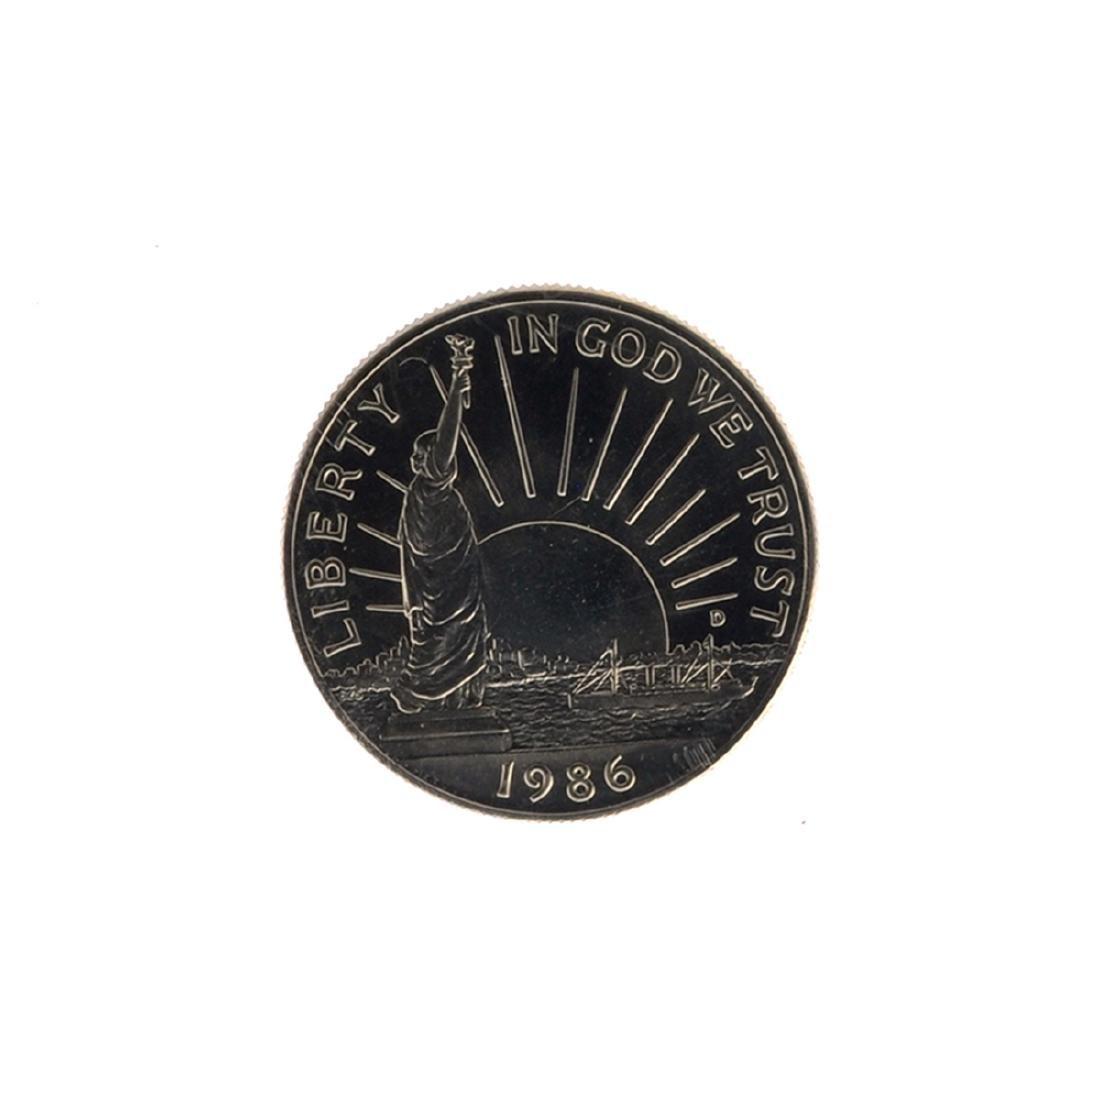 1986 Uncirculated Liberty Half Dollar Coin